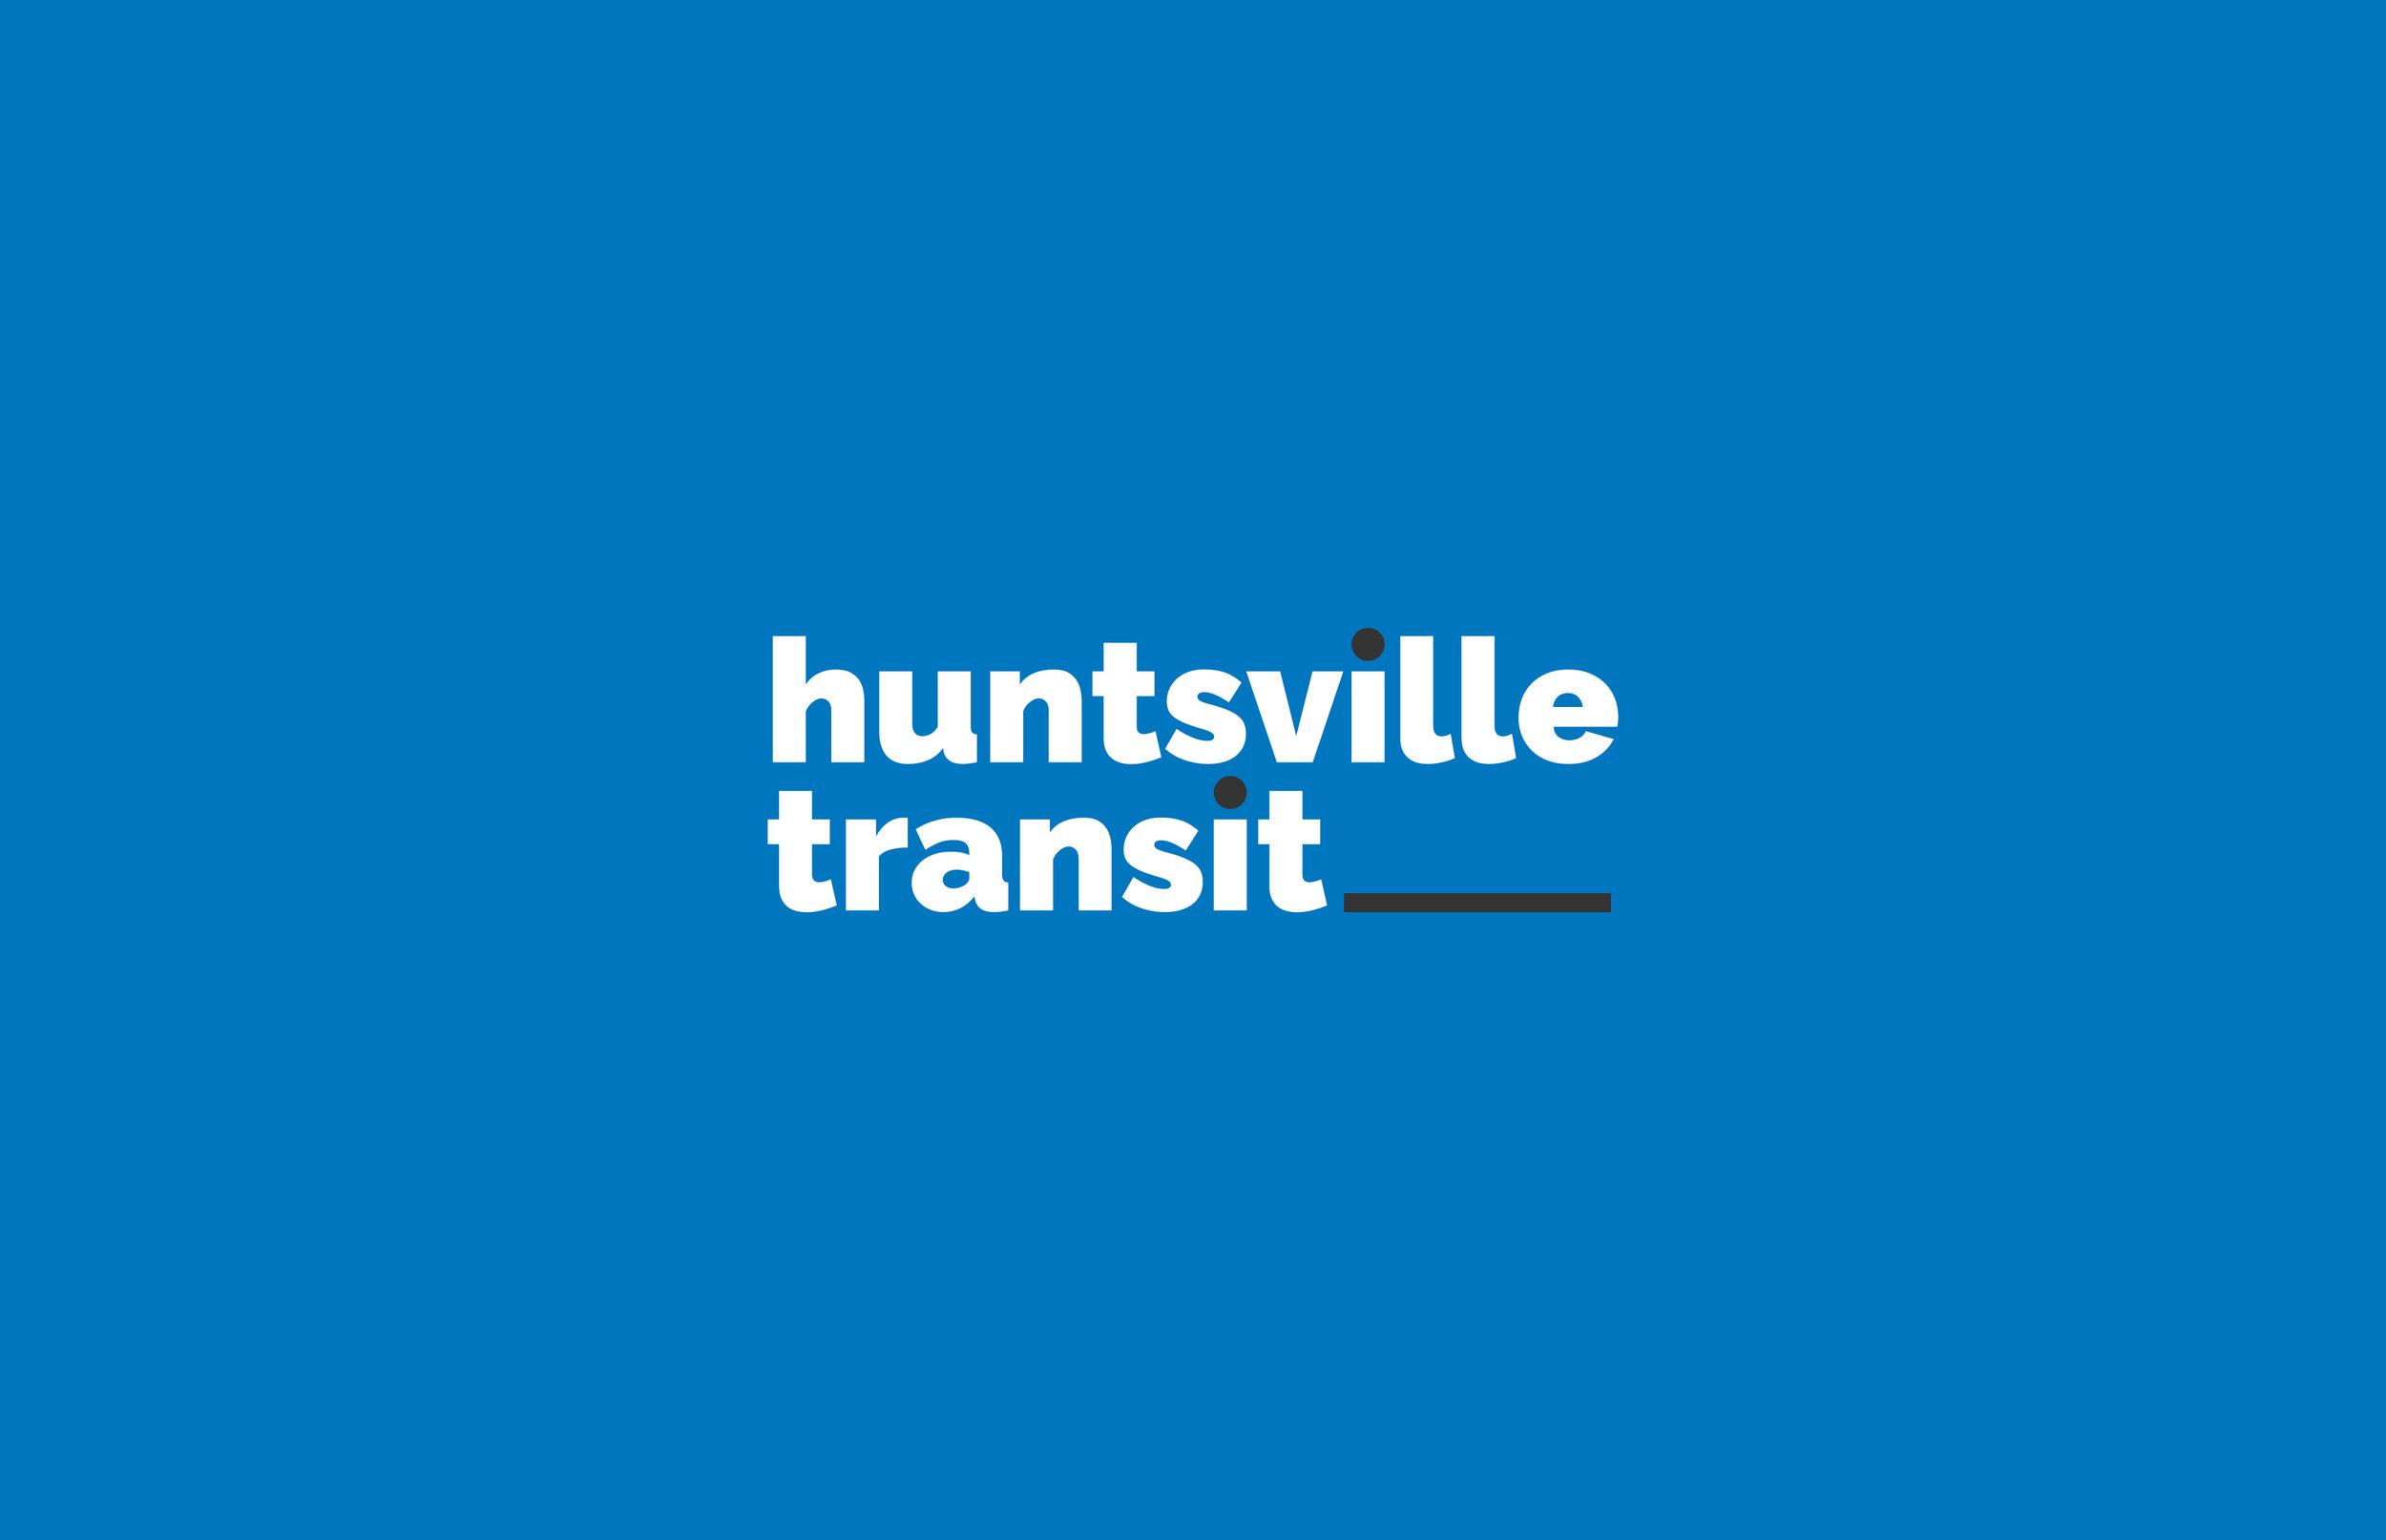 CityofHSV_PublicTransit_Rebrand_CONCEPT4_HT_logo_R4-v1-01.jpg